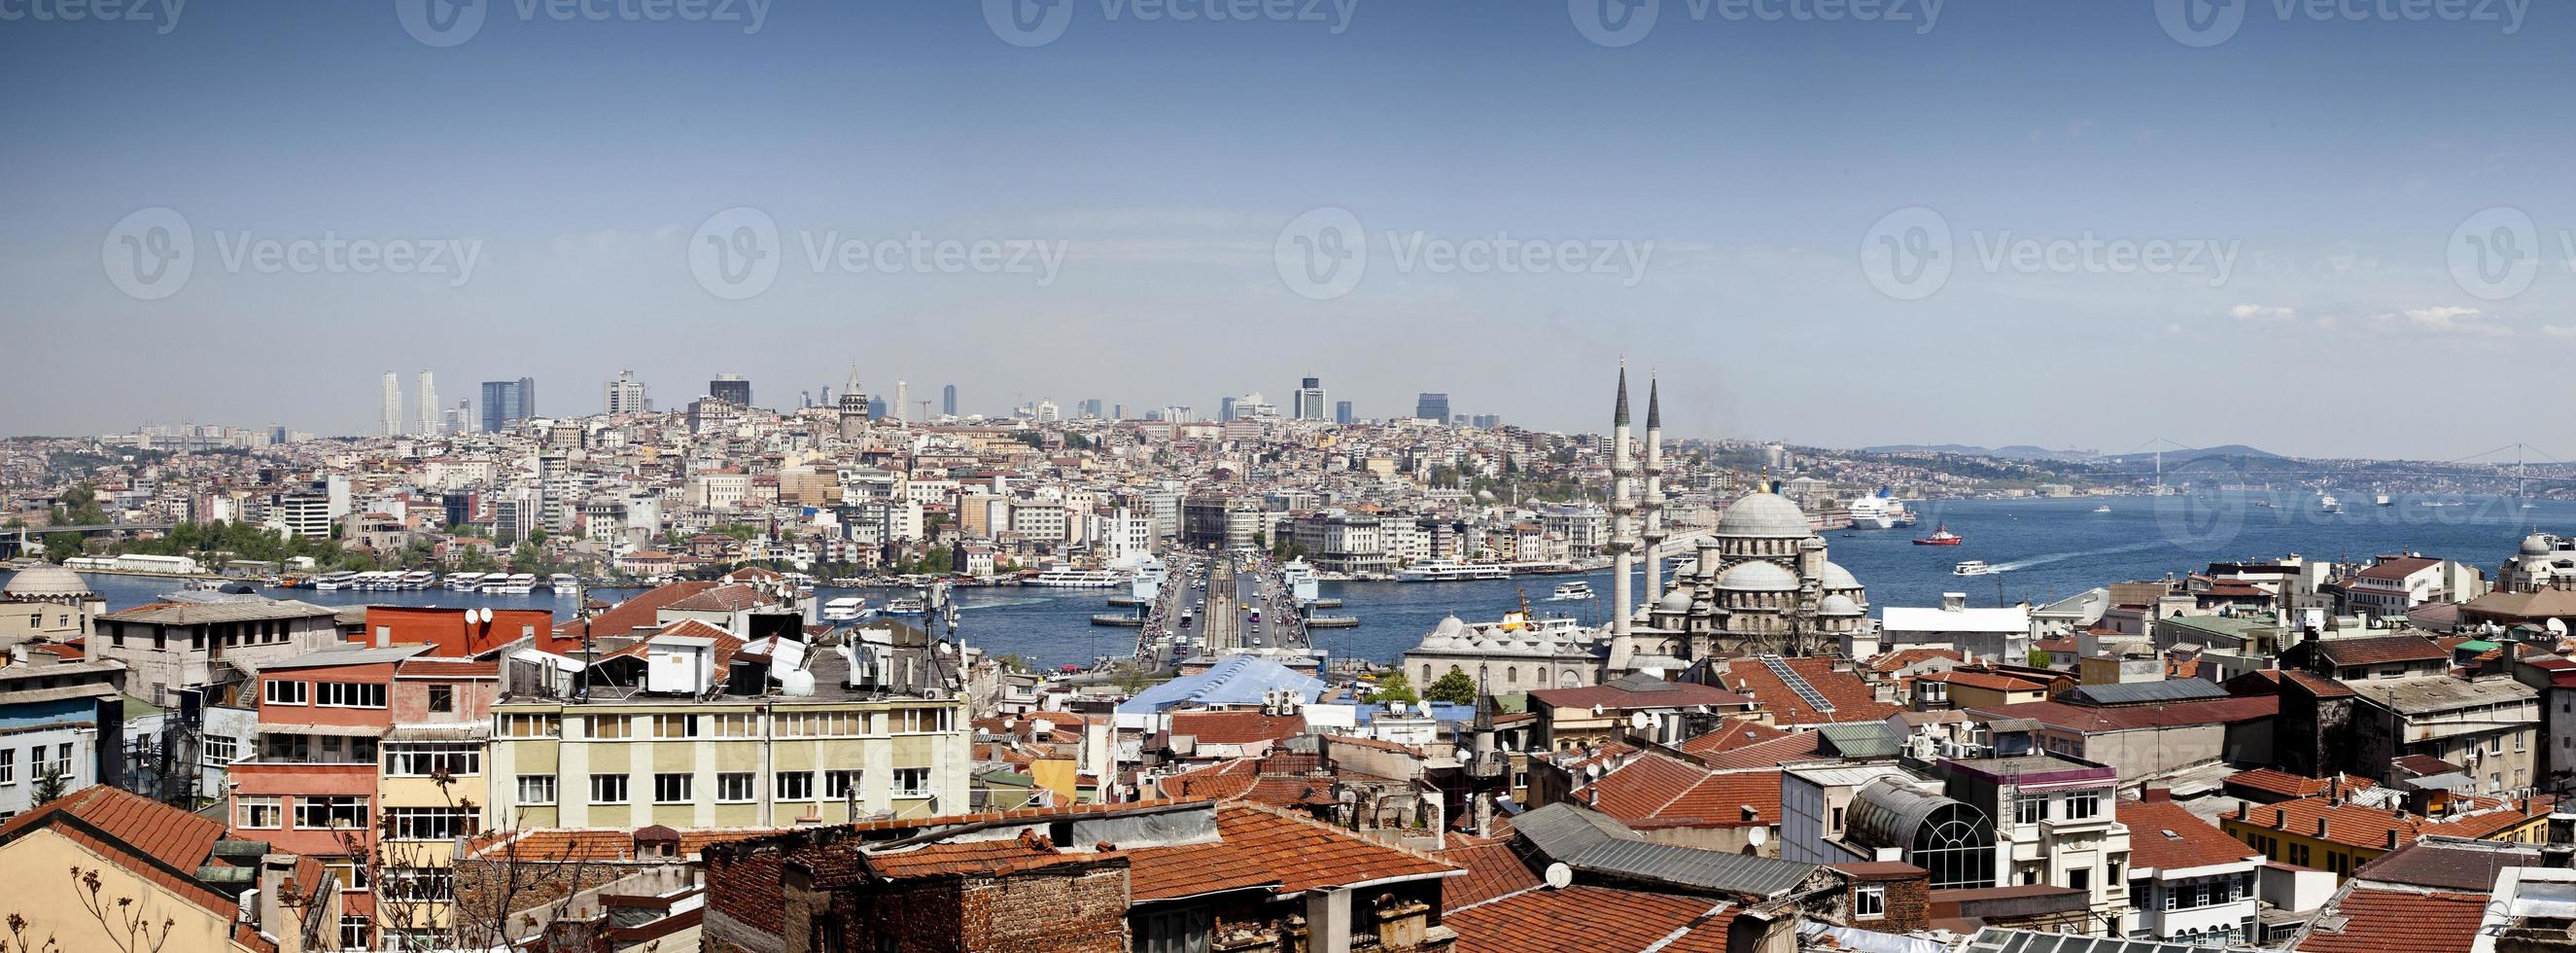 ponte di galata e moschea yeni (nuova) a istanbul foto